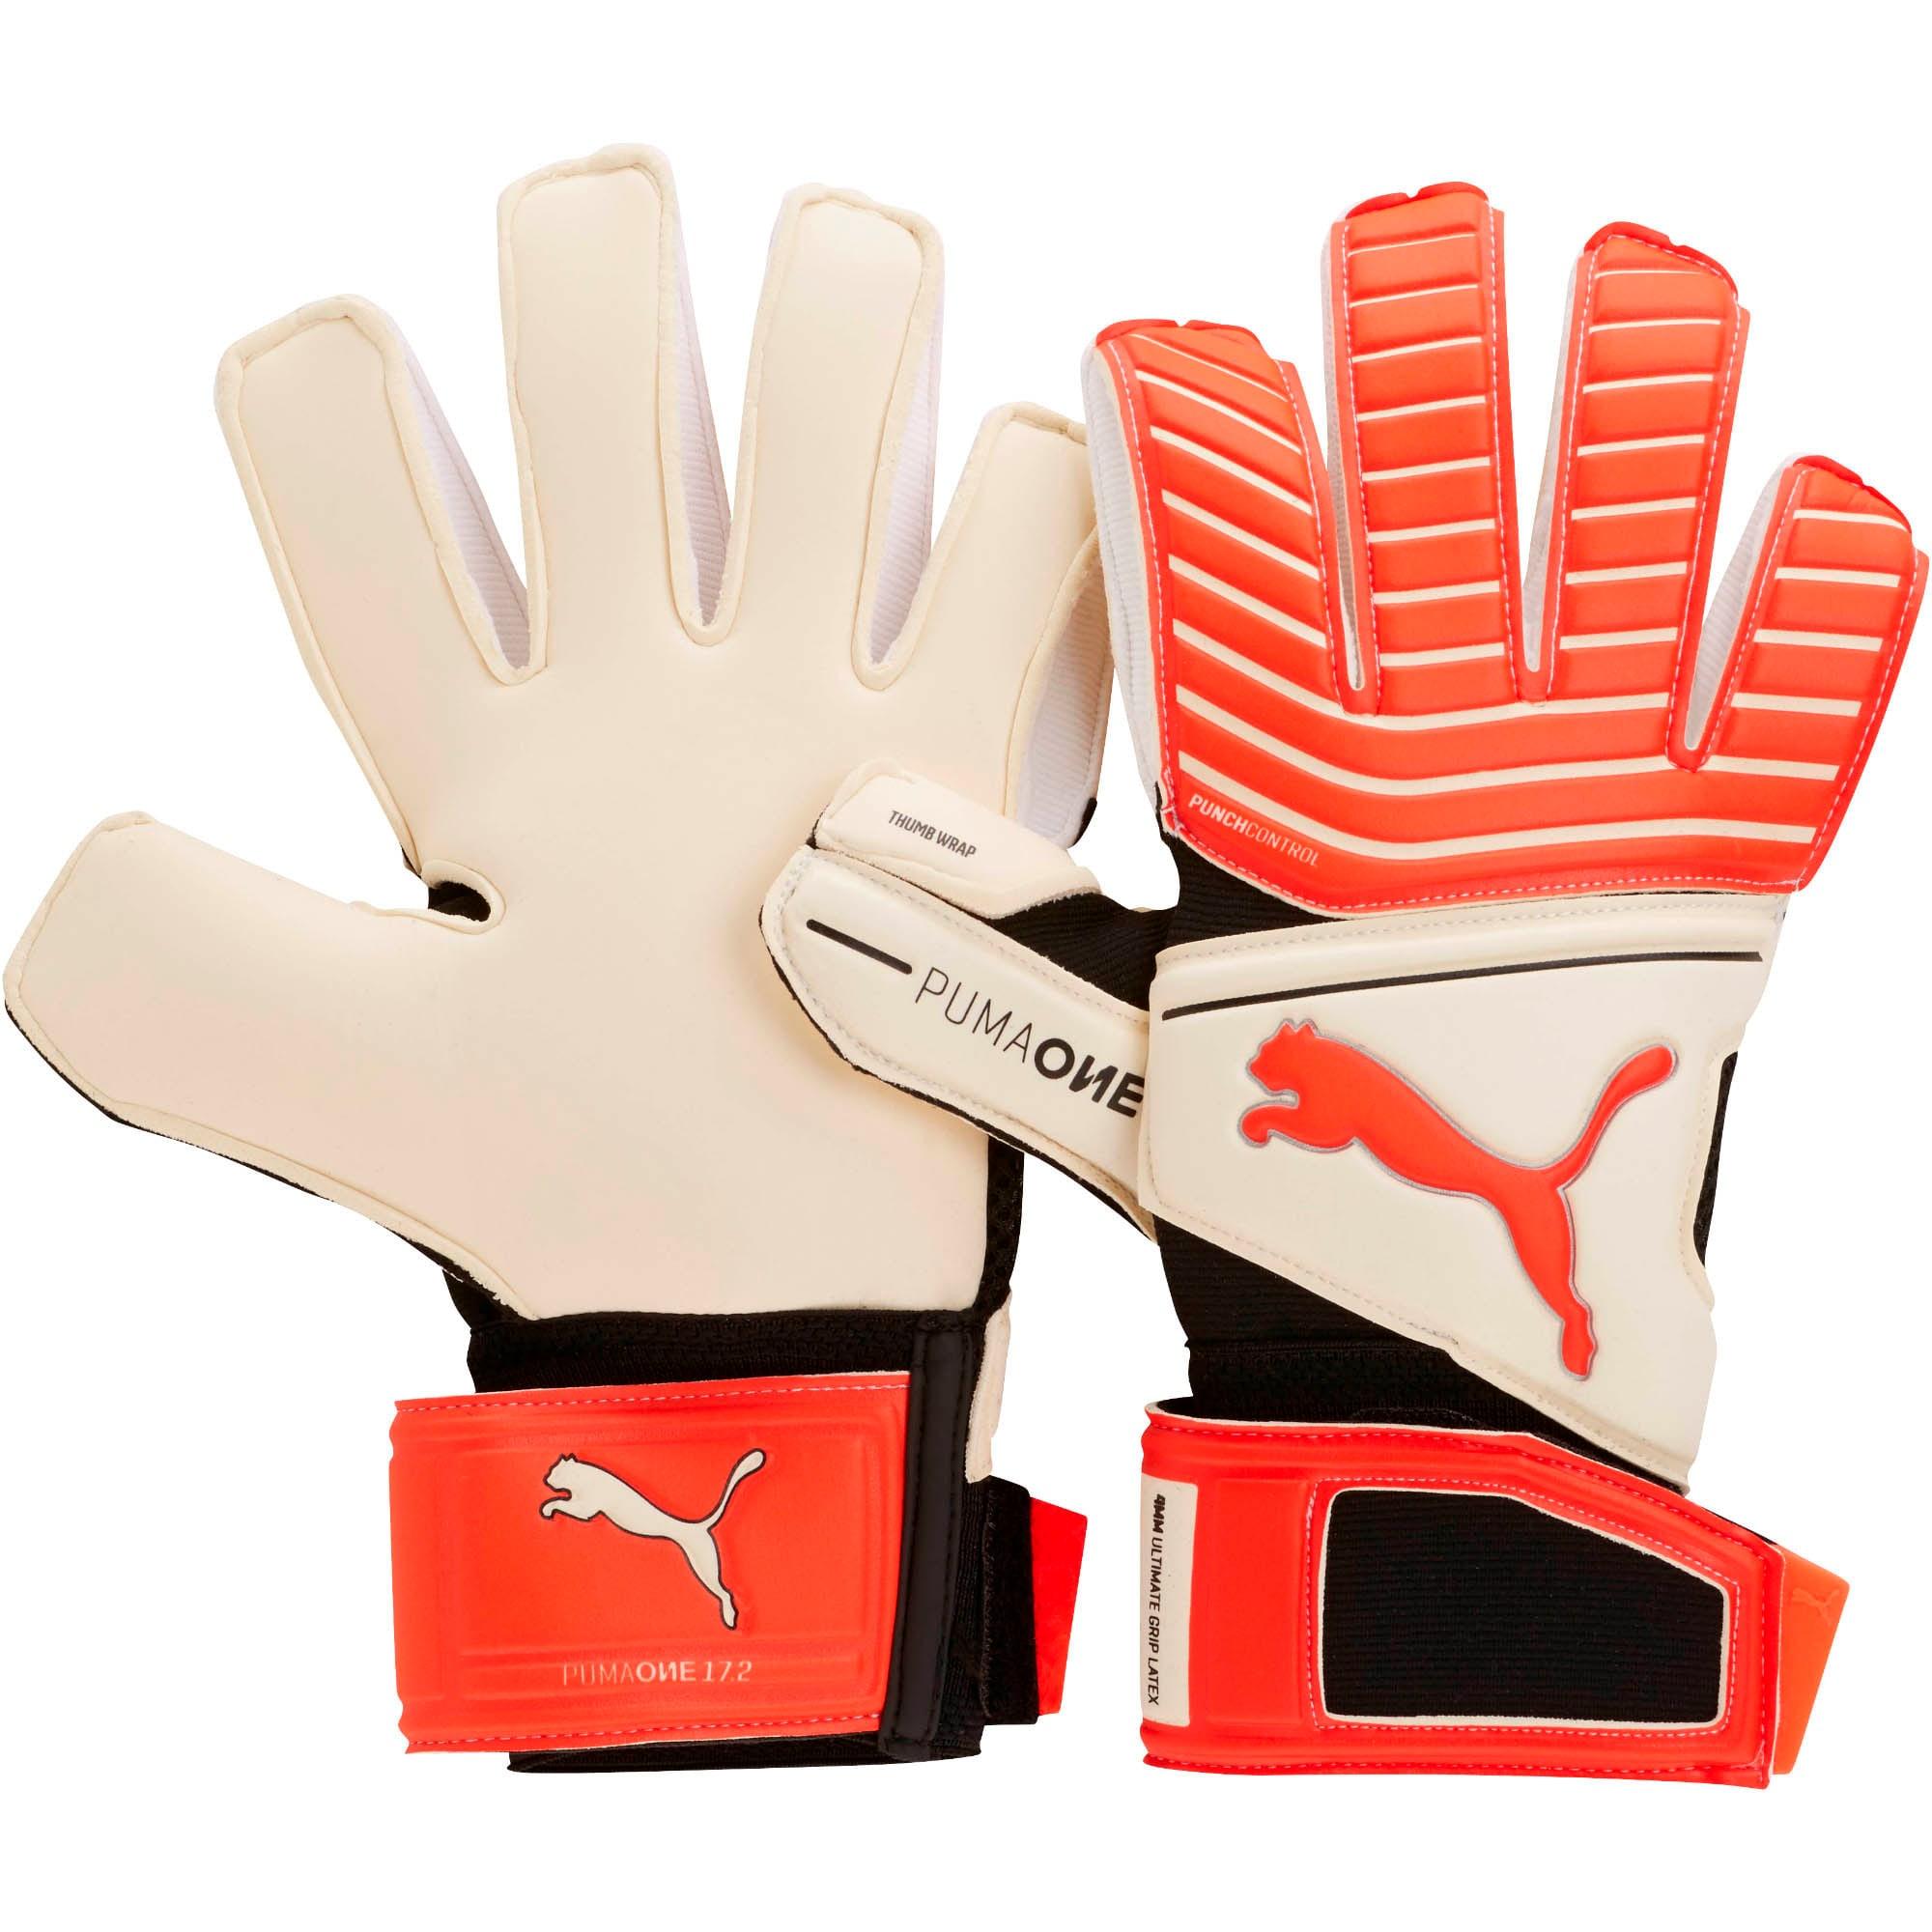 Thumbnail 1 of PUMA ONE Grip 17.2 Goalkeeper Gloves, White-Red Blast-Black-Silver, medium